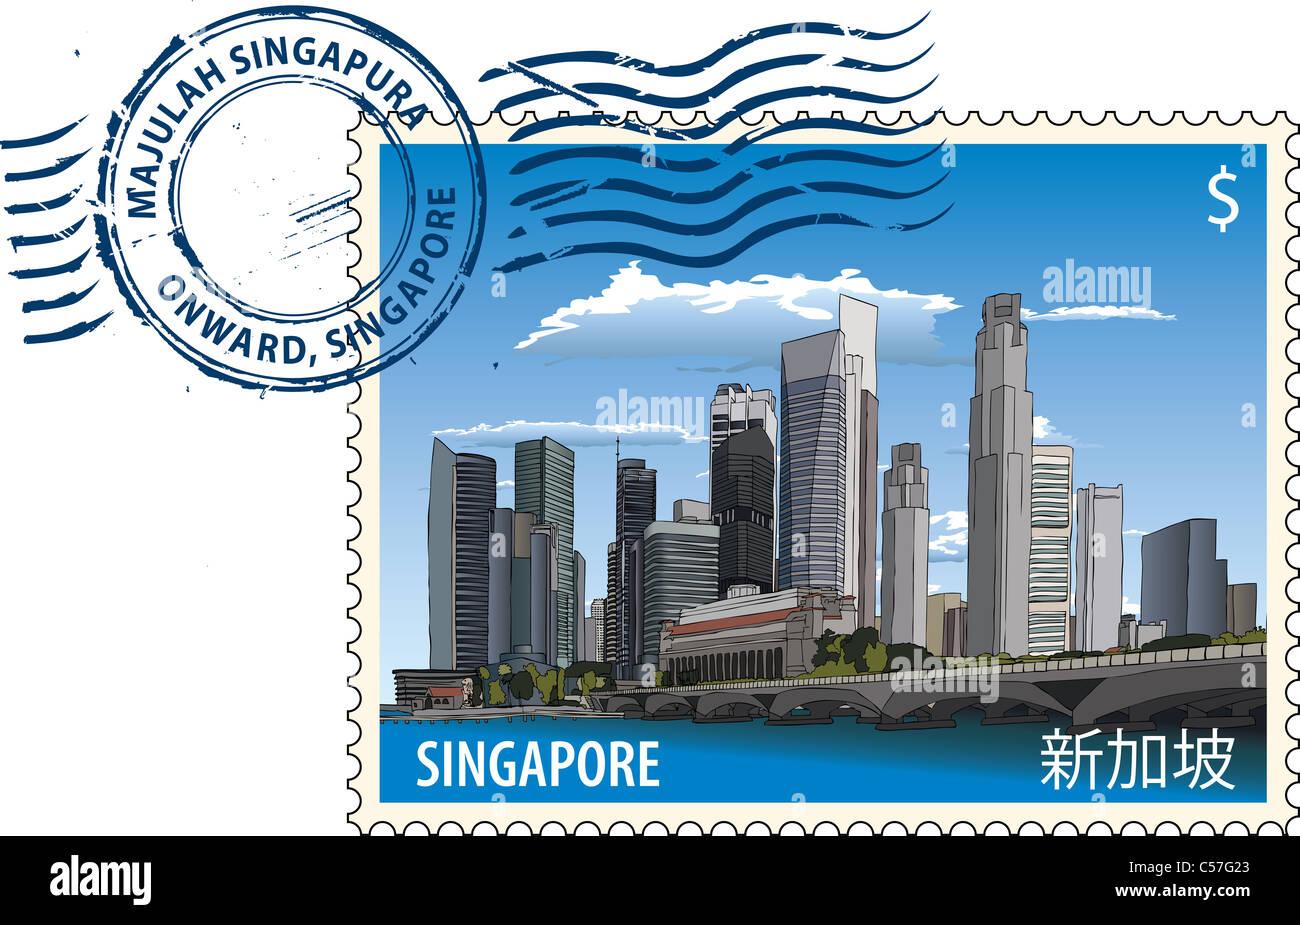 Postmark with Singapore cityscape - Stock Image